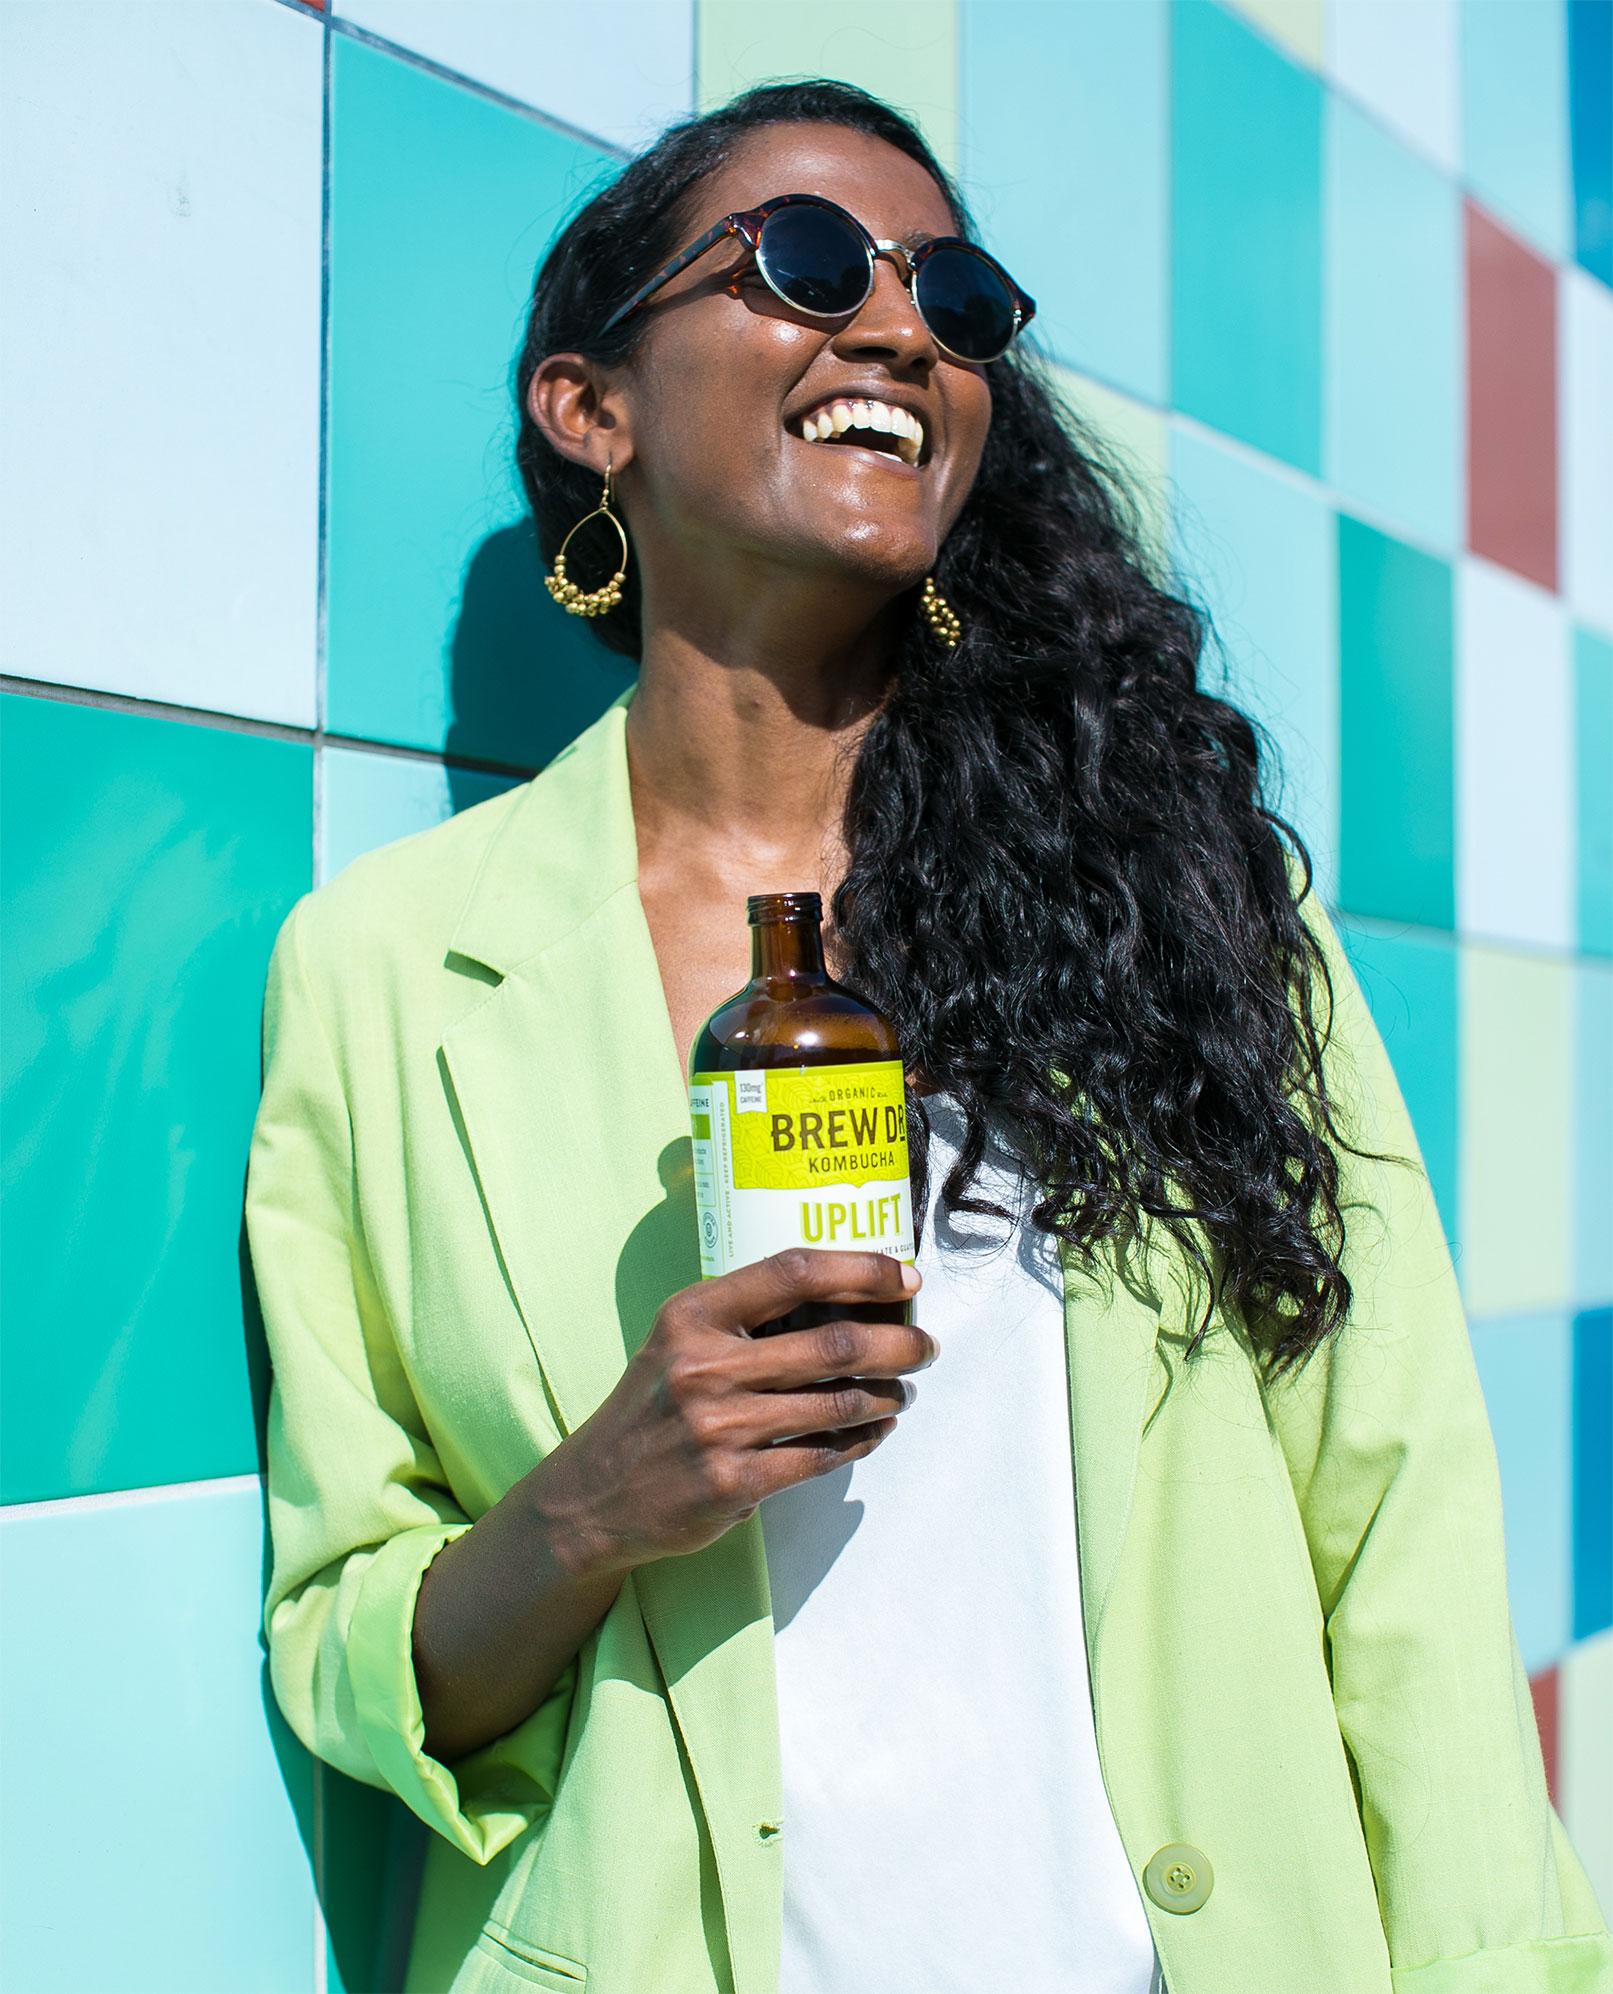 brew dr kombucha content creation by Meraki Narrative: A Branding, Design, and Creative Agency